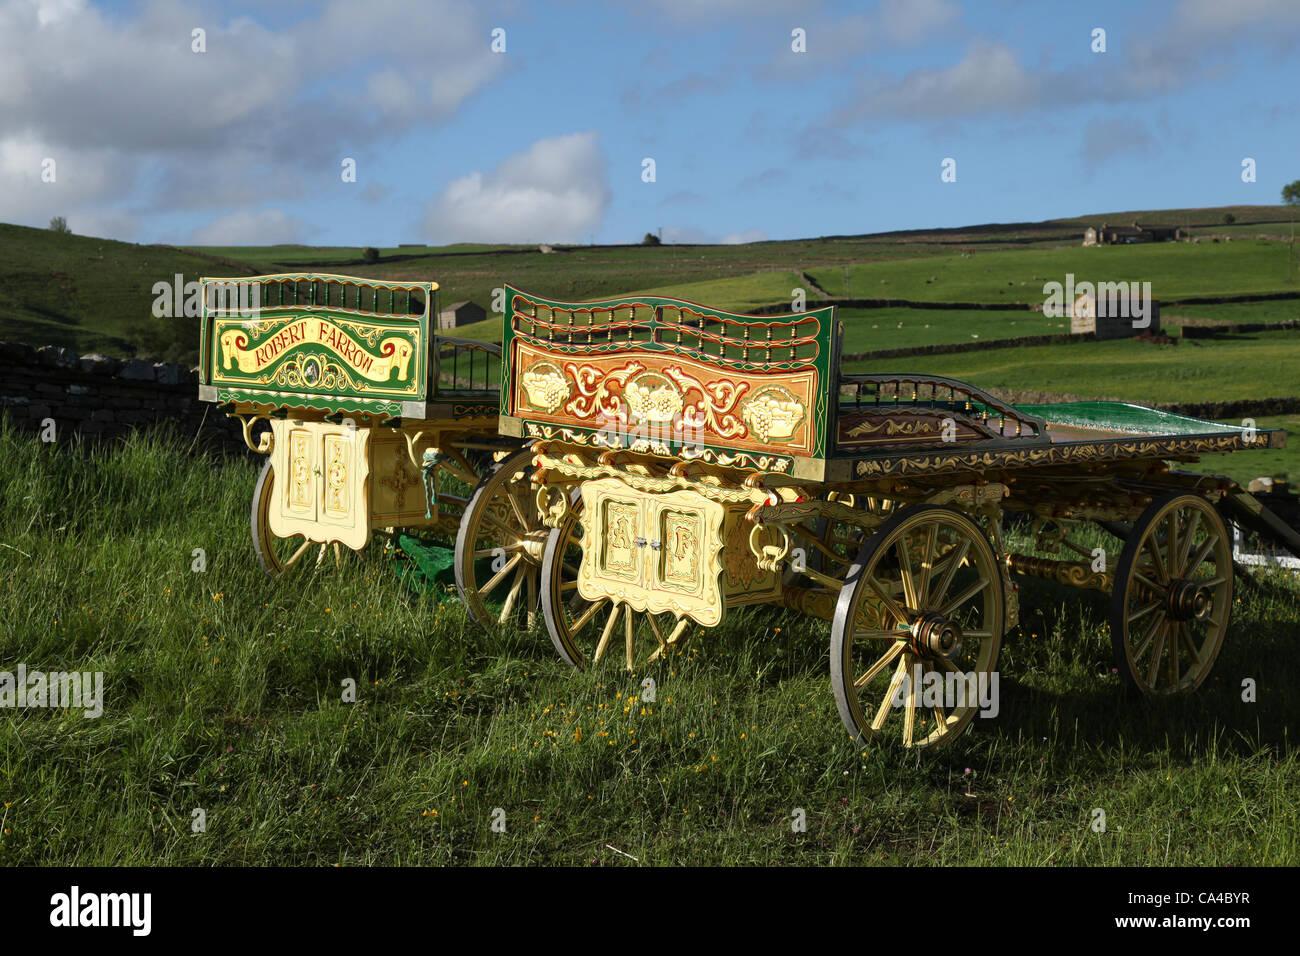 Monday 4th June 2012: Lambert & Baker Drays of the Travelling Community, horse and cart camping at Bainbridge, in Stock Photo